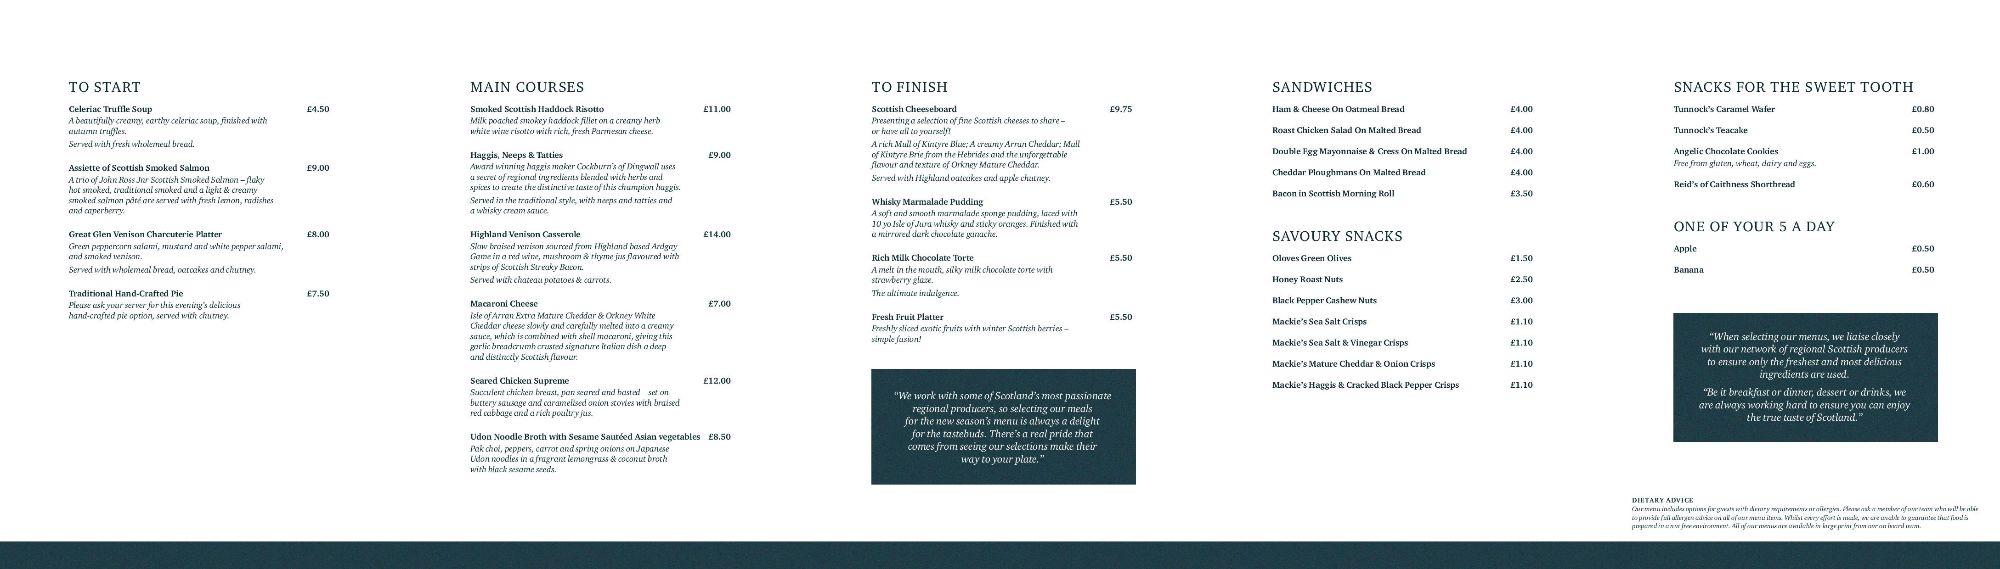 Image showing a sample of the Caledonian Sleeper highlander menu circa 2019.